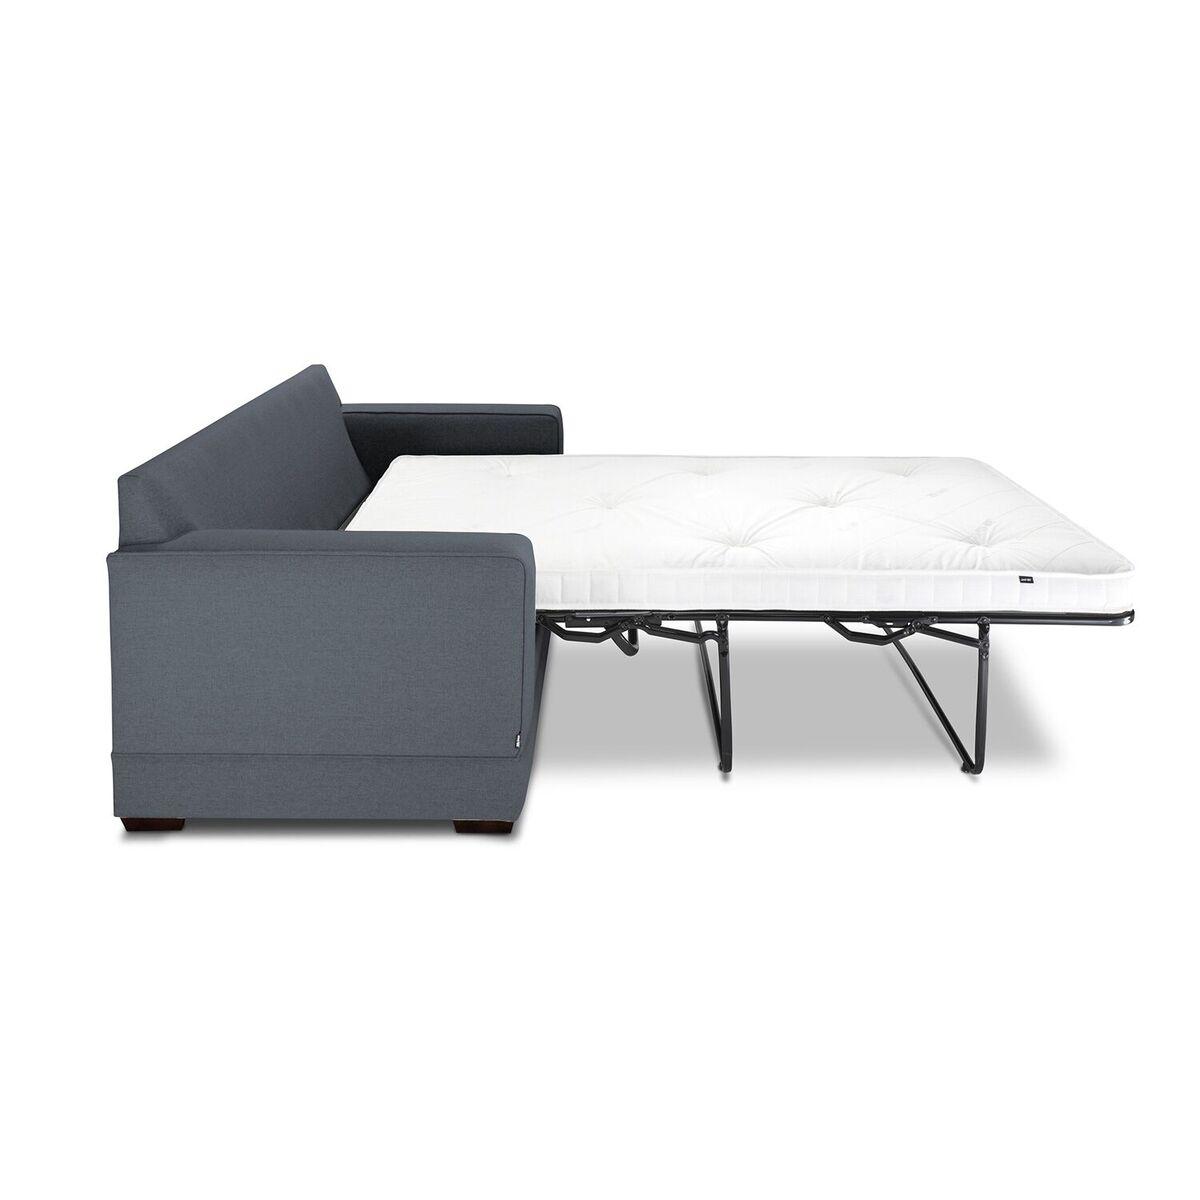 denim sofas uk sleeper sofa new york jay be modern bed with pocket sprung mattress fads